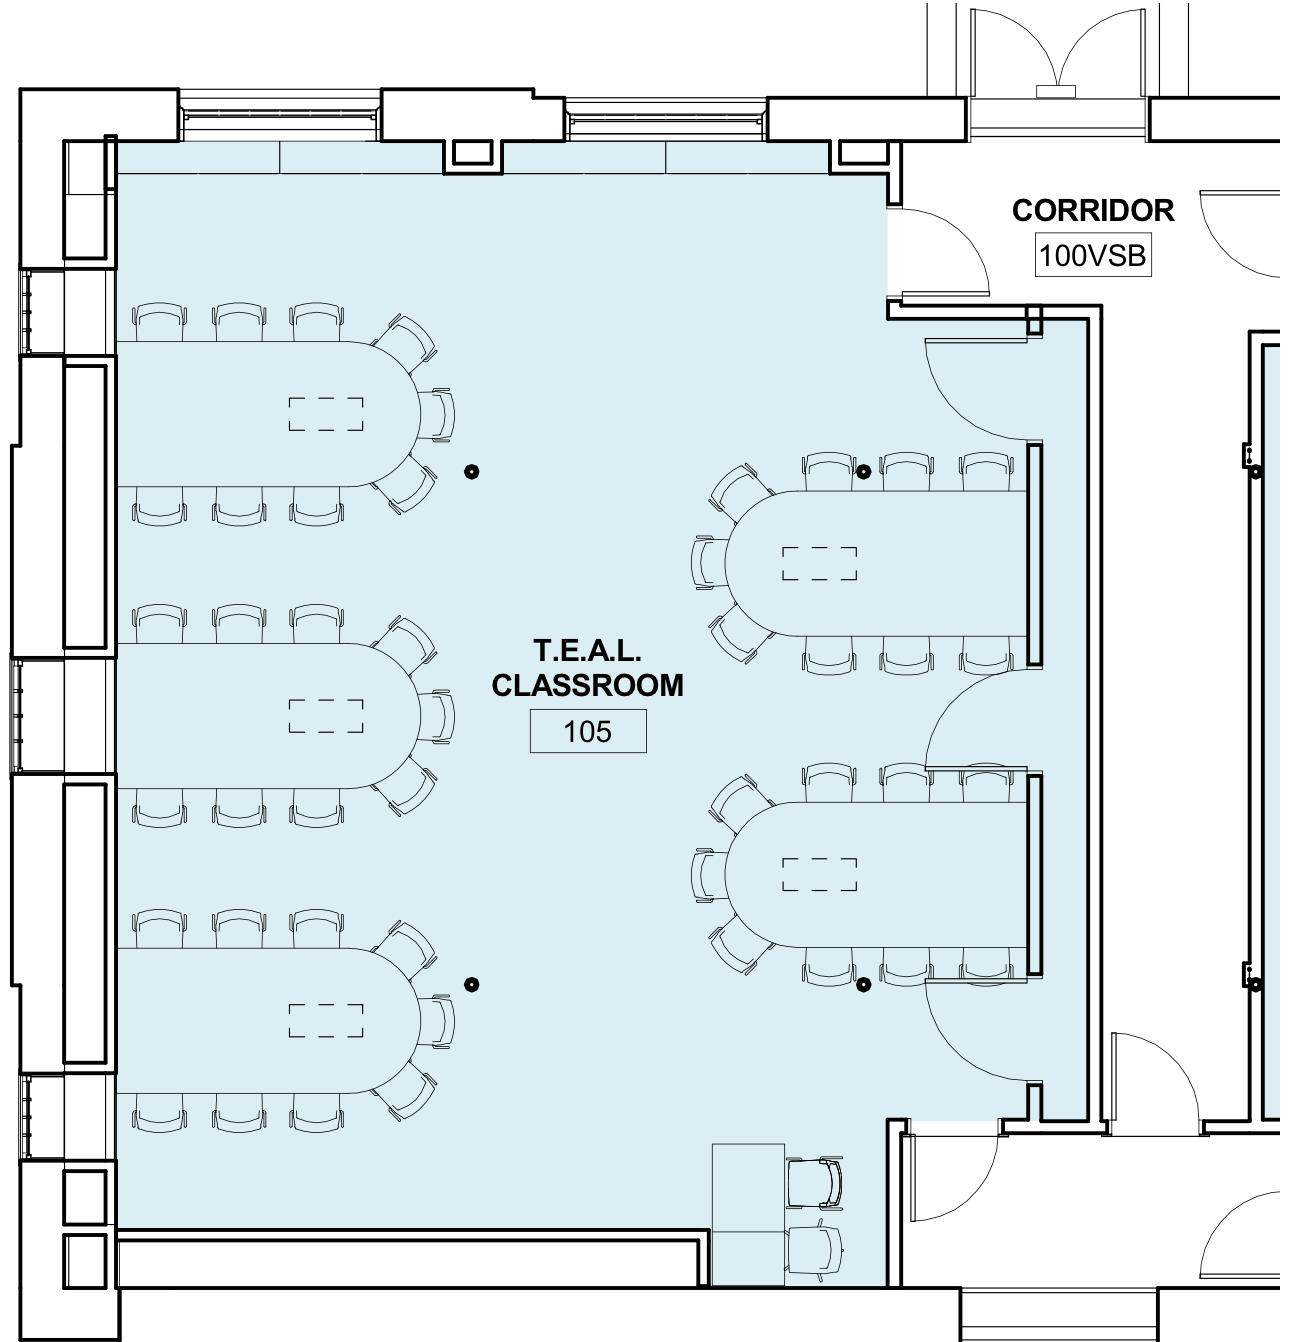 Image of Hamilton-Smith TEAL 45-seat blueprint